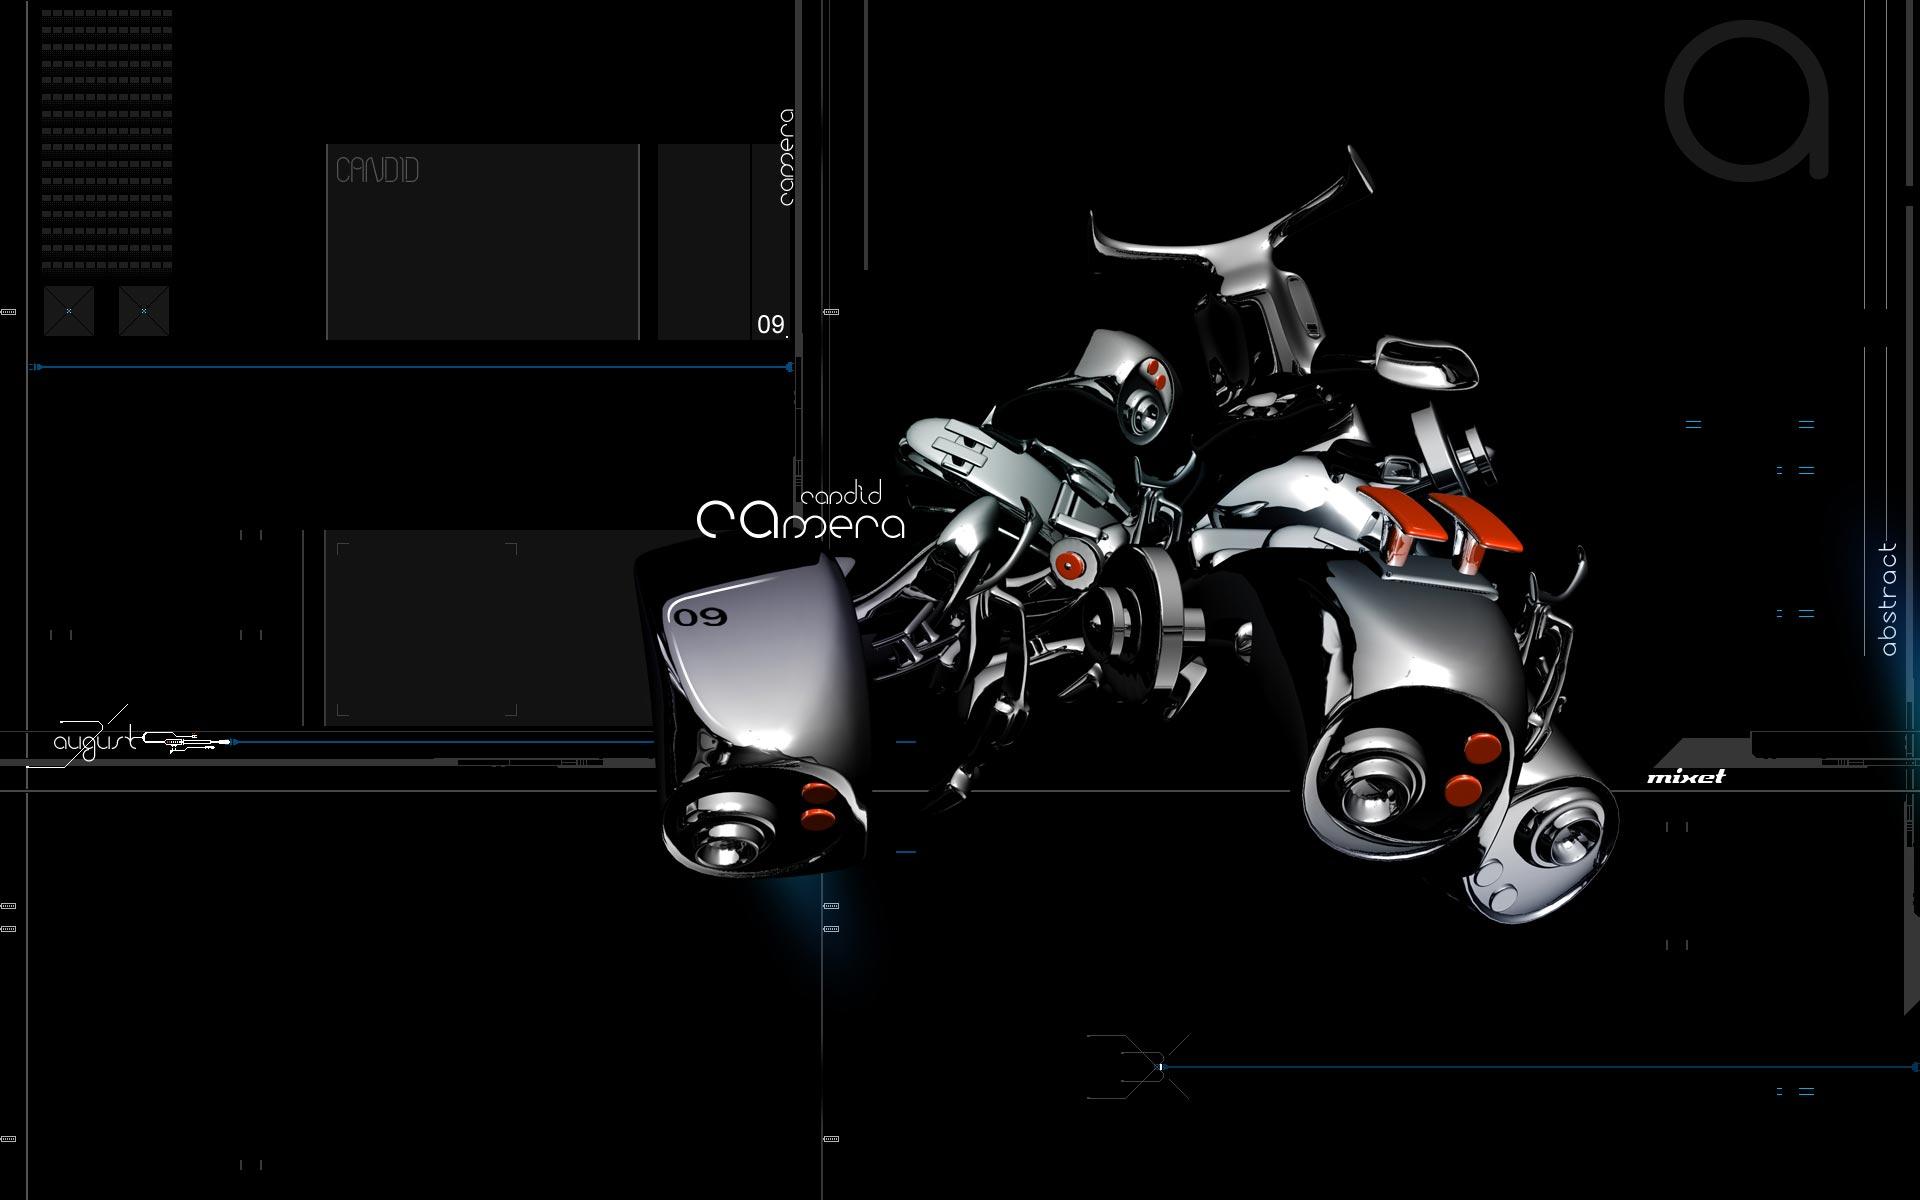 Autos Y Motos Fondos De Escritorio Full Hd 3d: Moto Computer Wallpapers, Desktop Backgrounds